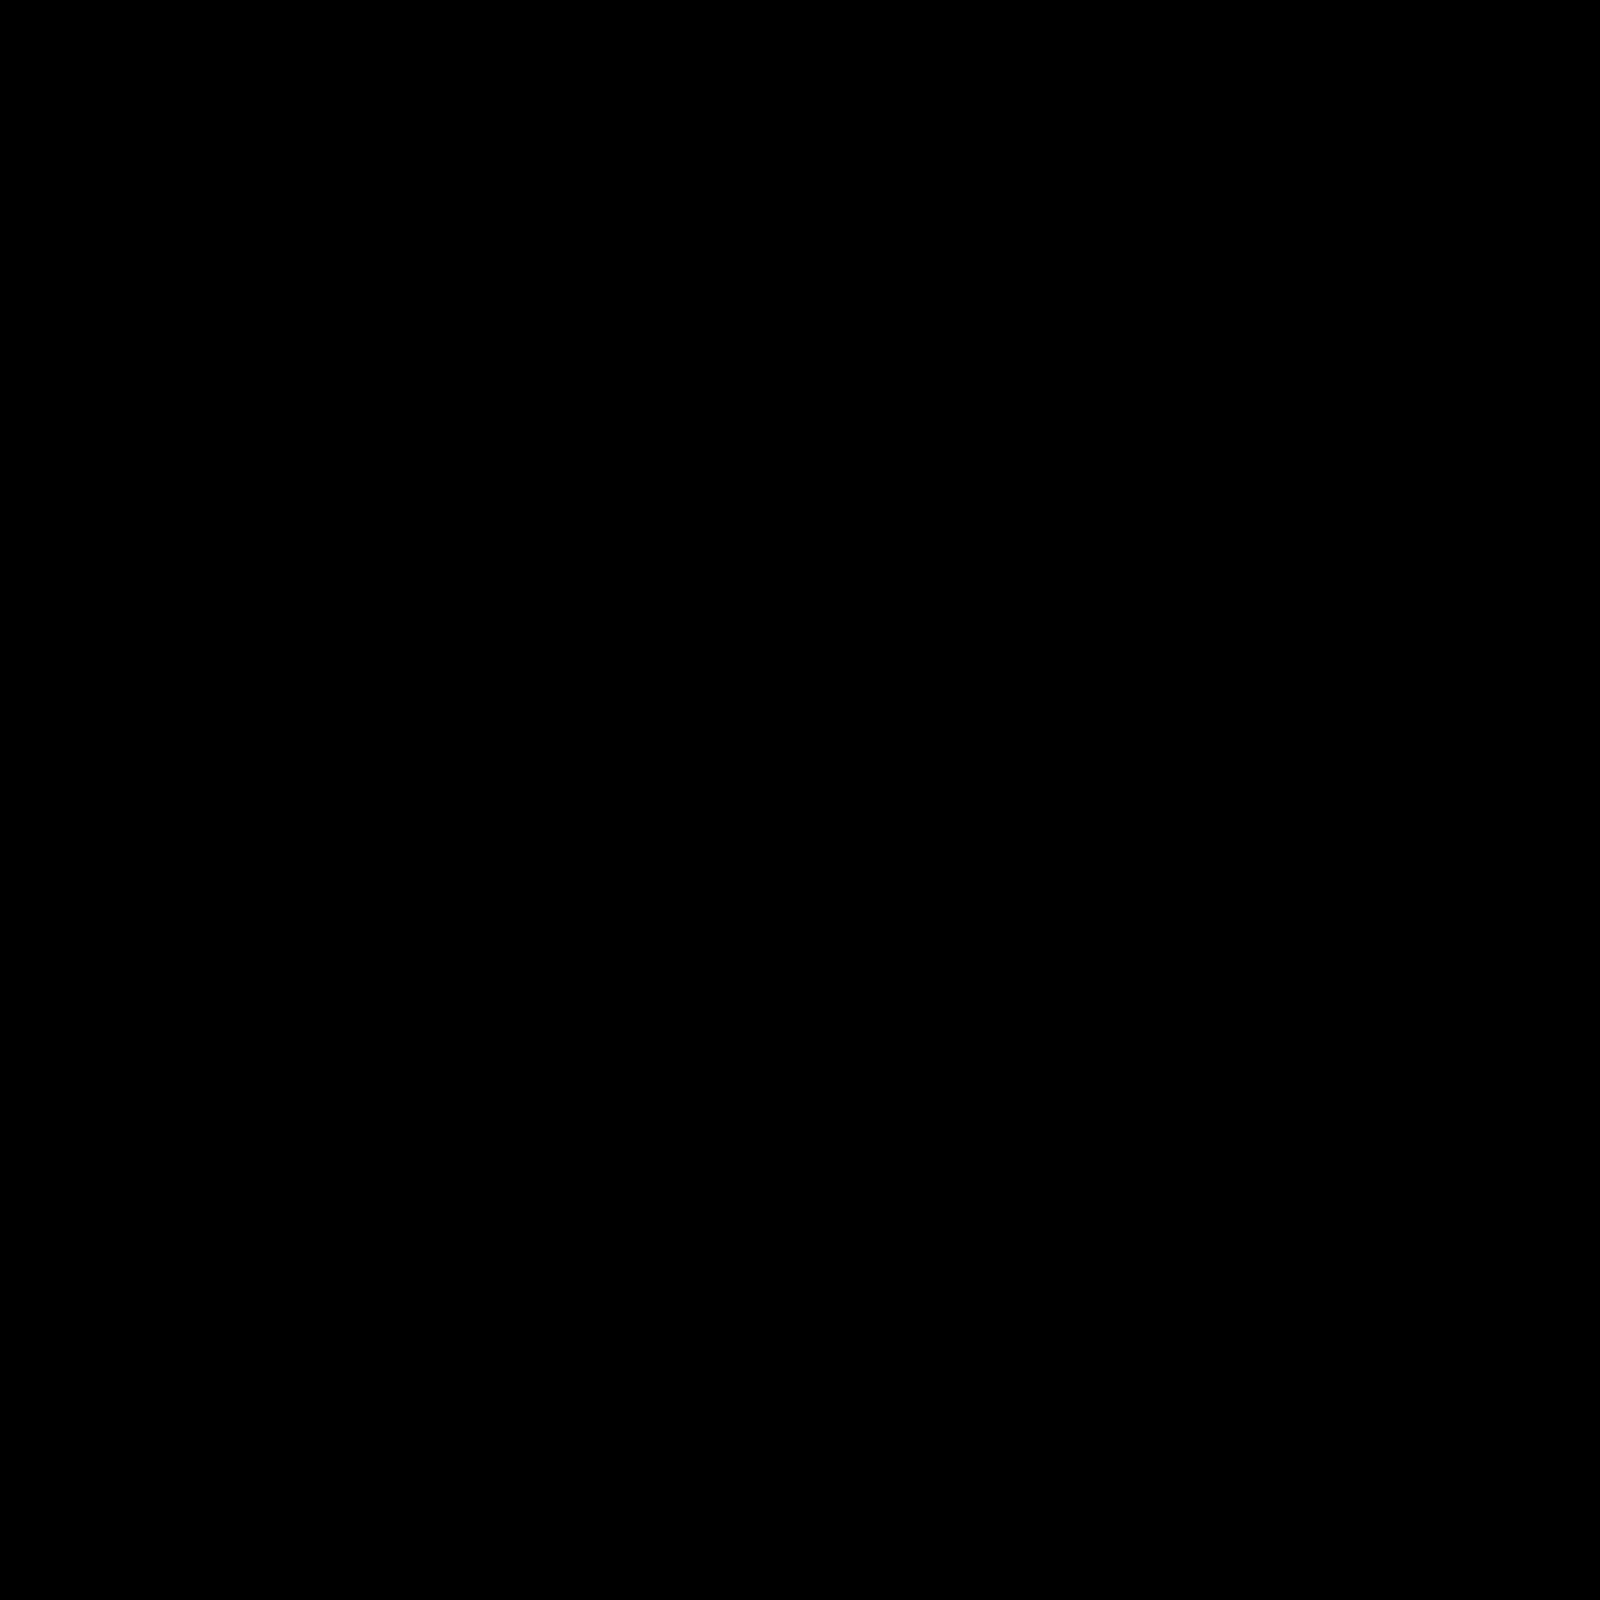 Kiwi clipart circle. Icon free download png